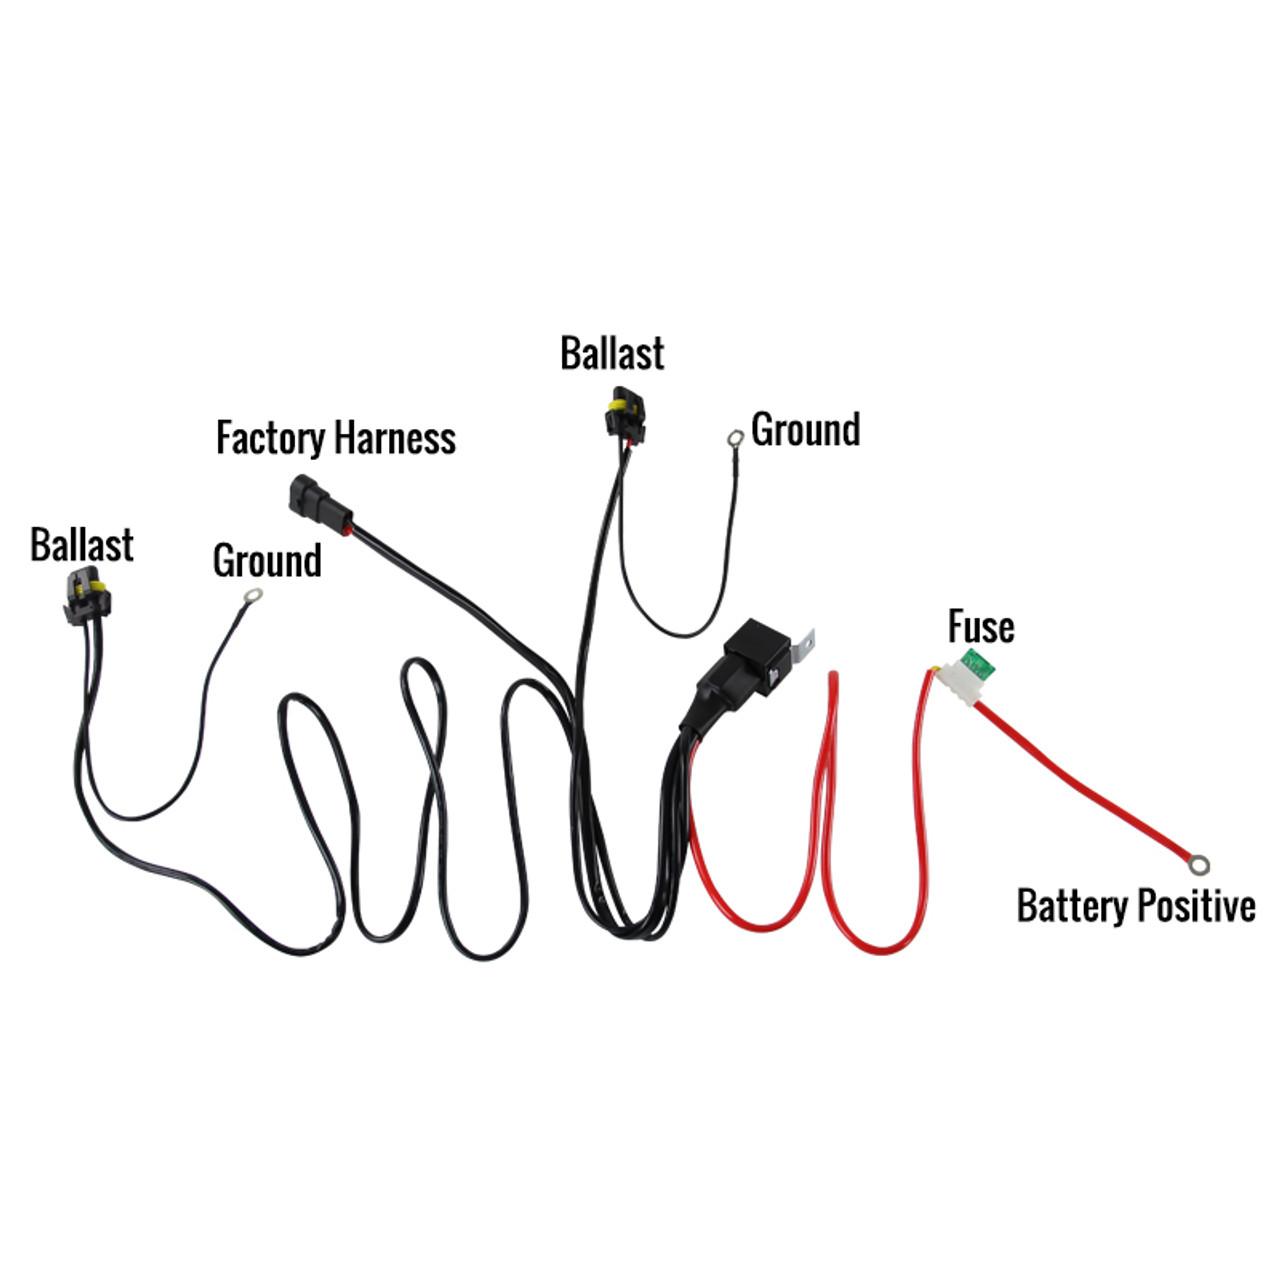 Spec D Headlight Wiring Diagram - Bmw 635csi Wiring Diagram -  cusshman.ati-loro.jeanjaures37.fr | Spec D Tuning Headlight Wiring Diagram |  | Wiring Diagram Resource